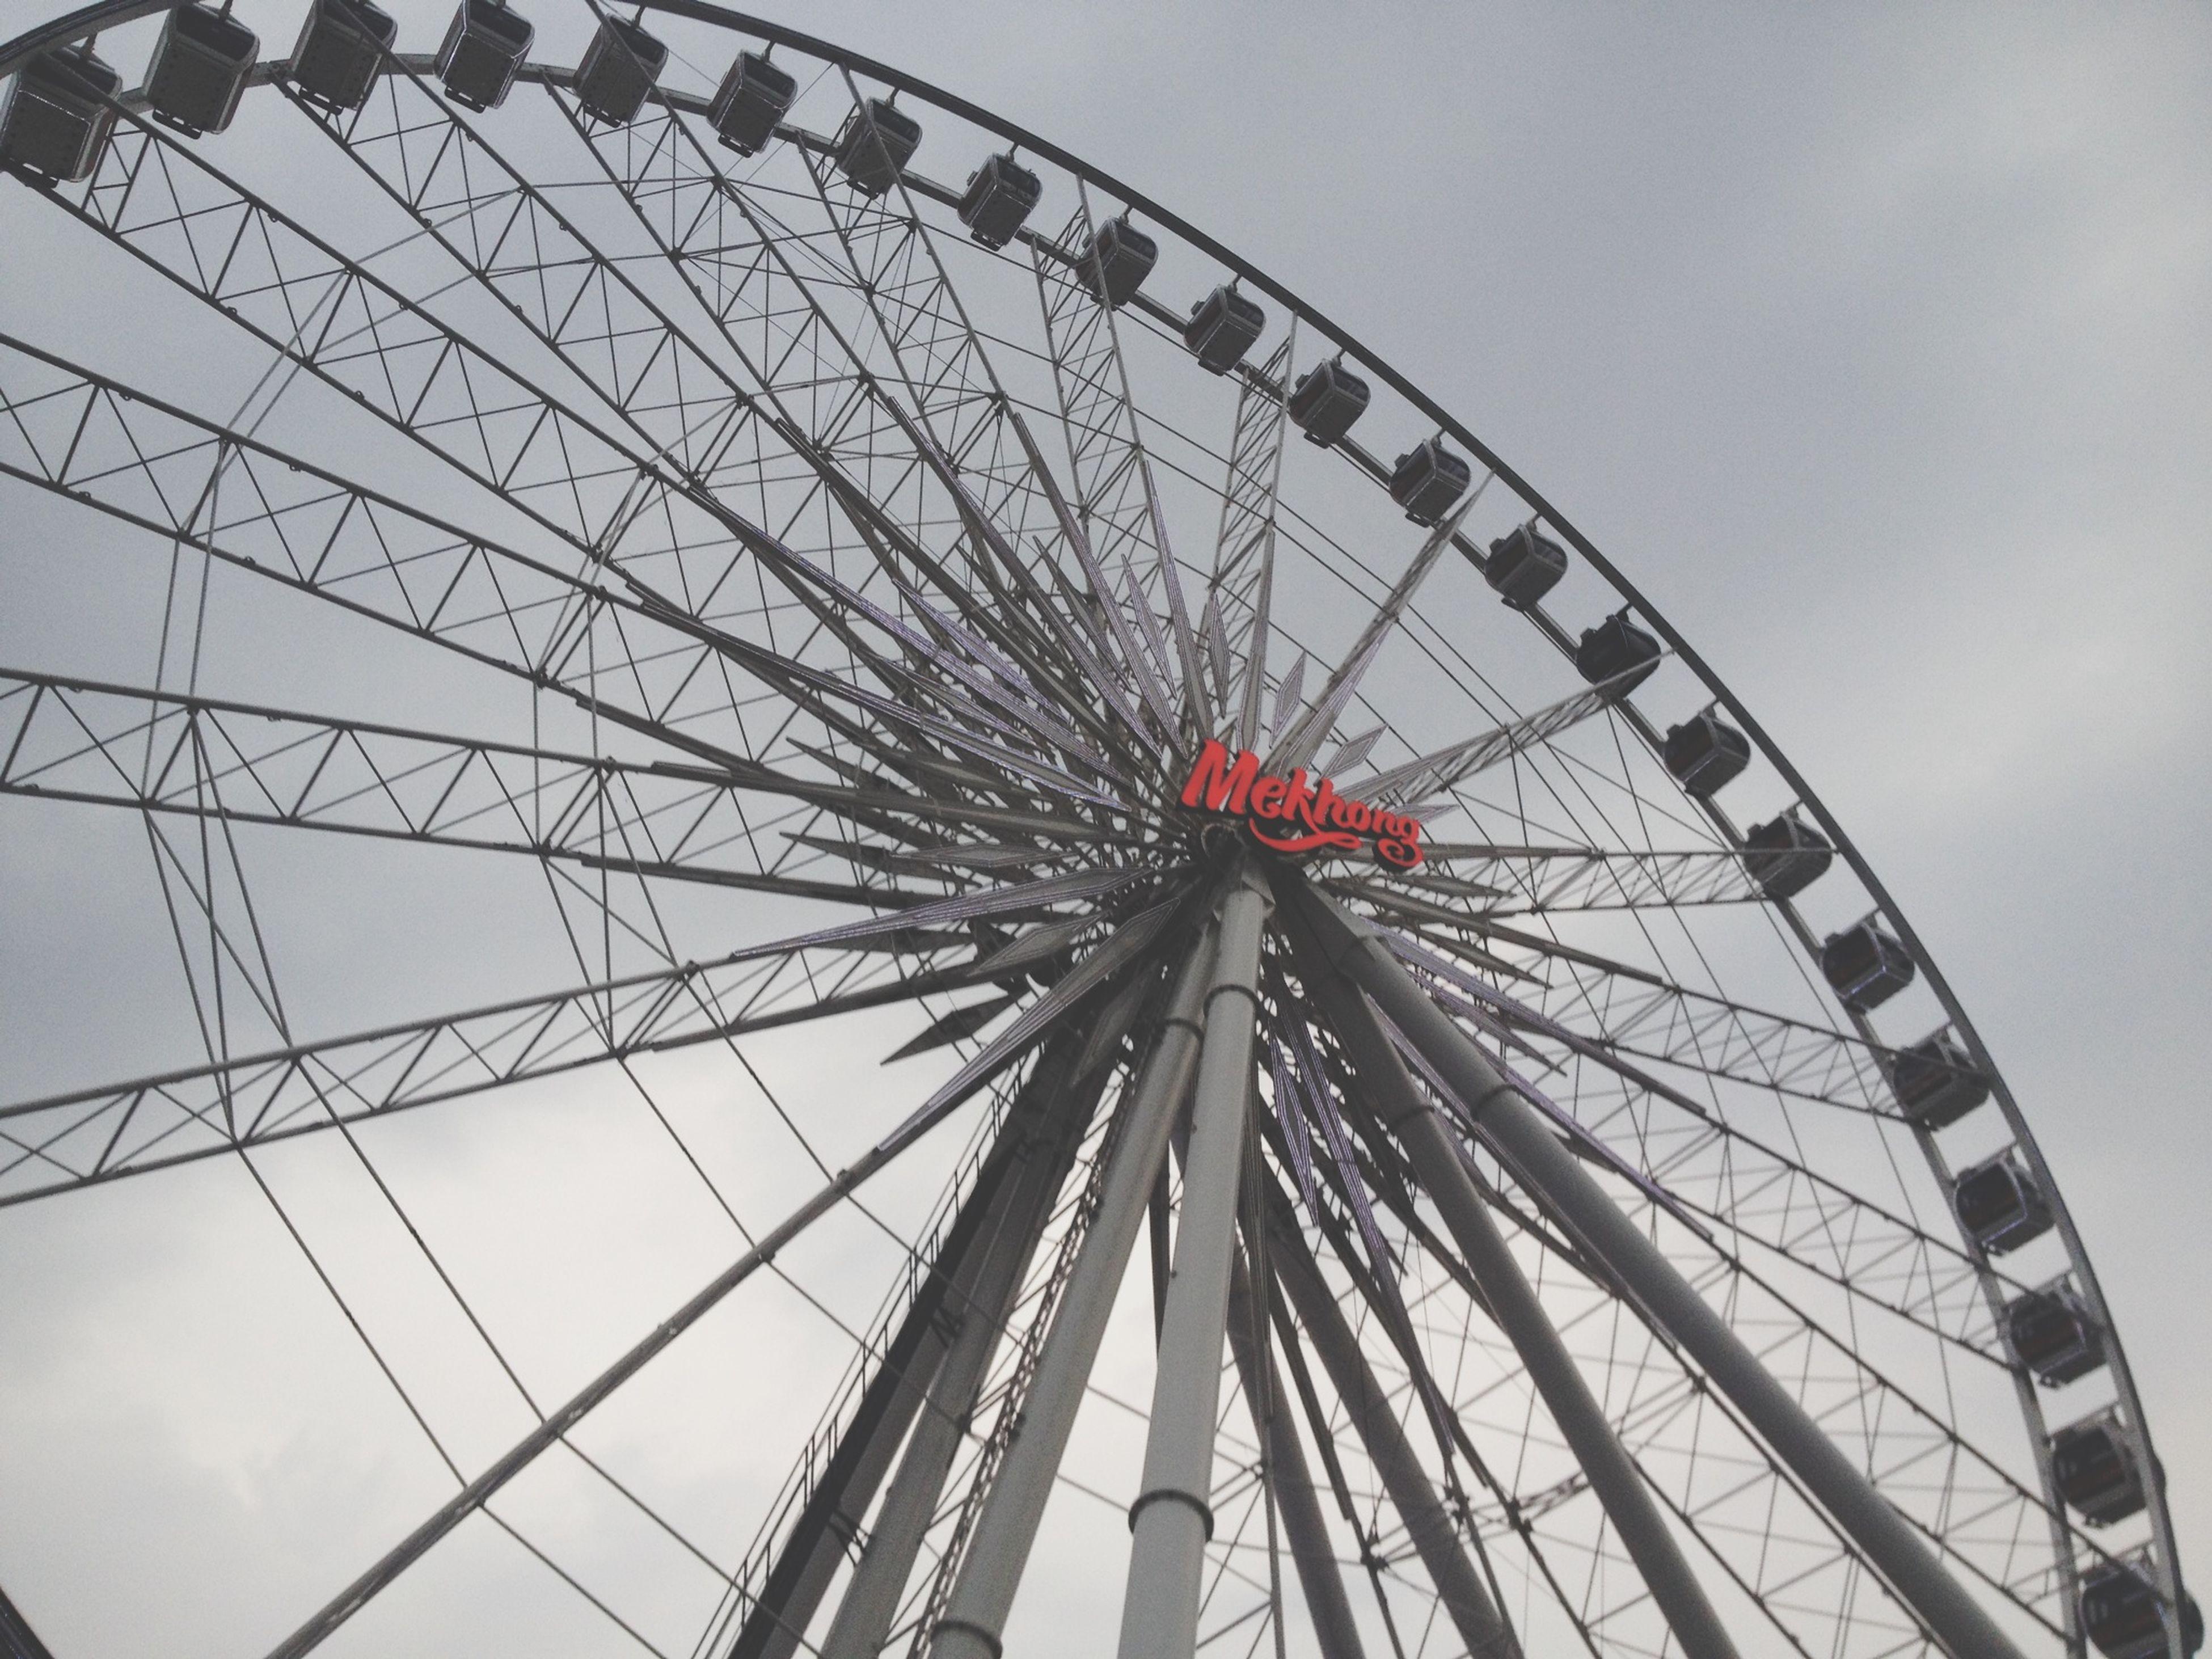 ferris wheel, amusement park ride, amusement park, arts culture and entertainment, low angle view, built structure, architecture, sky, metal, fairground, day, big wheel, large, outdoors, fun, fairground ride, no people, circle, travel destinations, rollercoaster